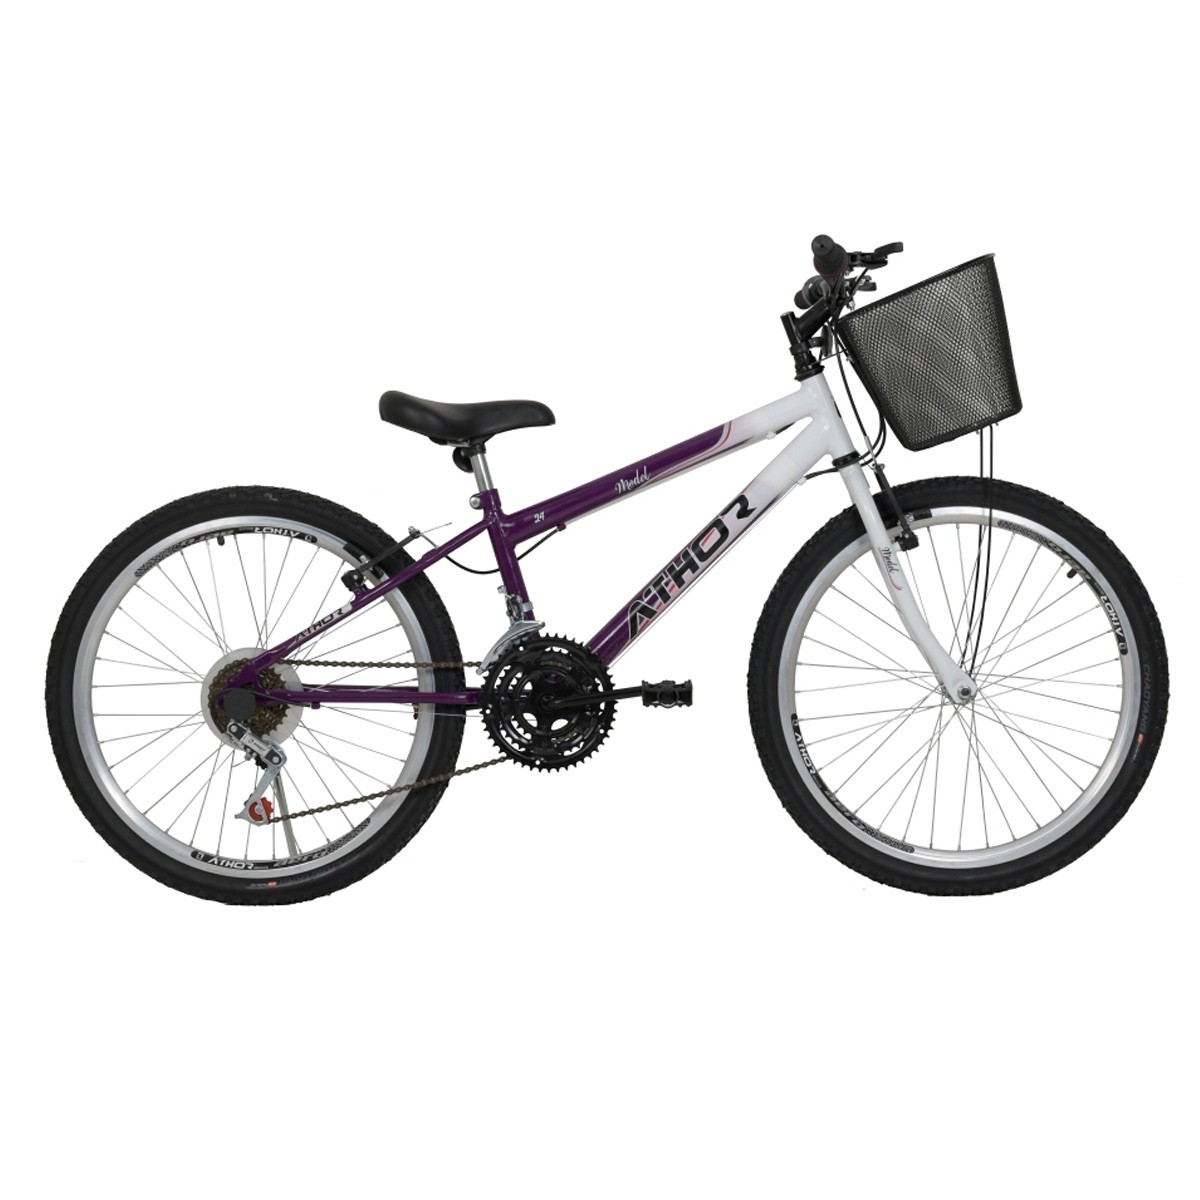 Bicicleta Athor Model Infantil Aro 24 18v Feminina C/ Cesto